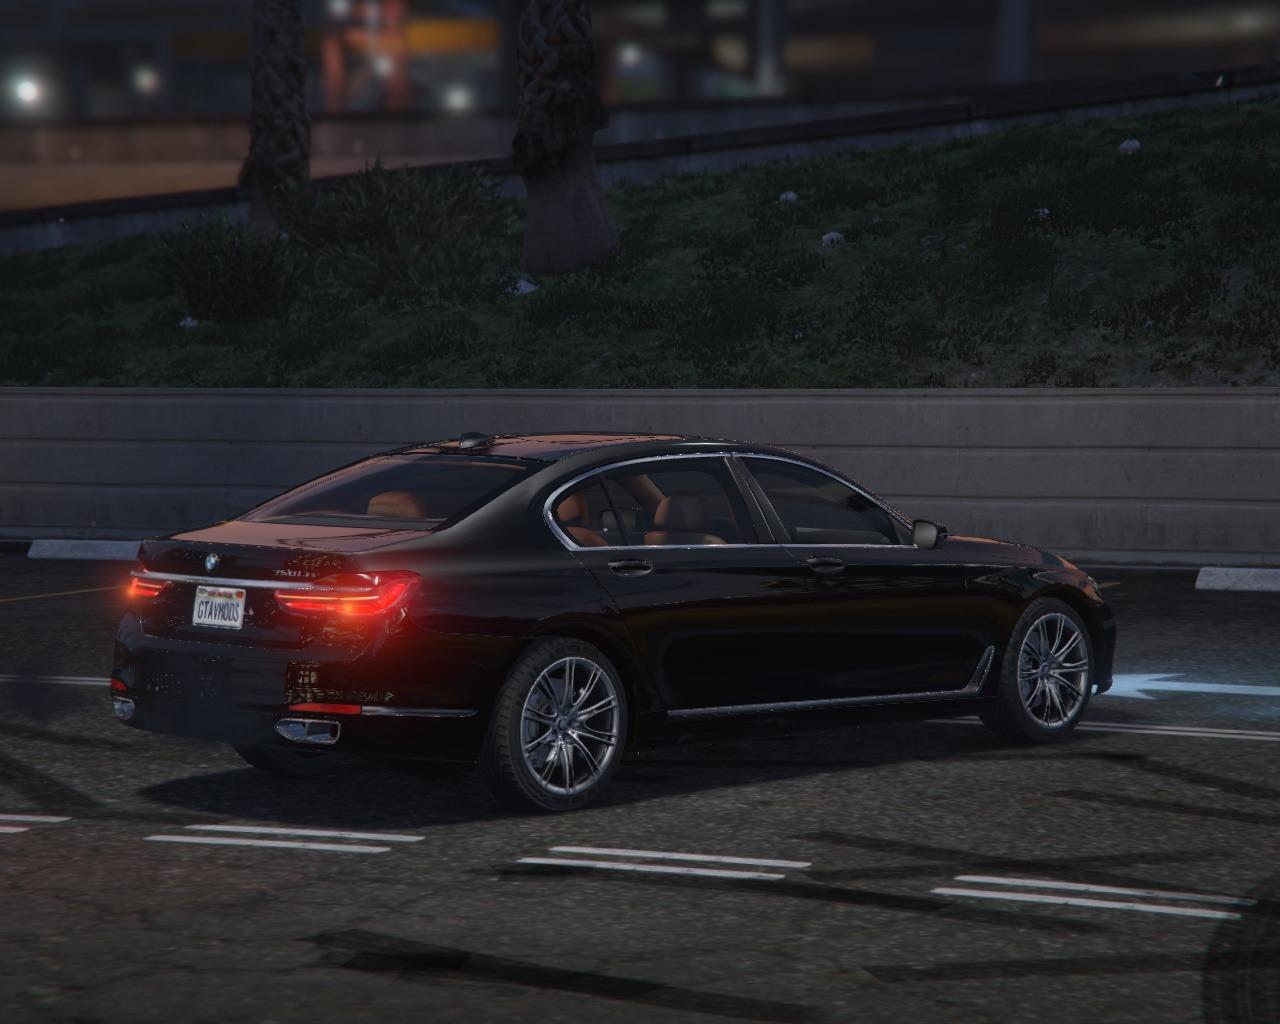 Gta  Regarder A L Interieur Car